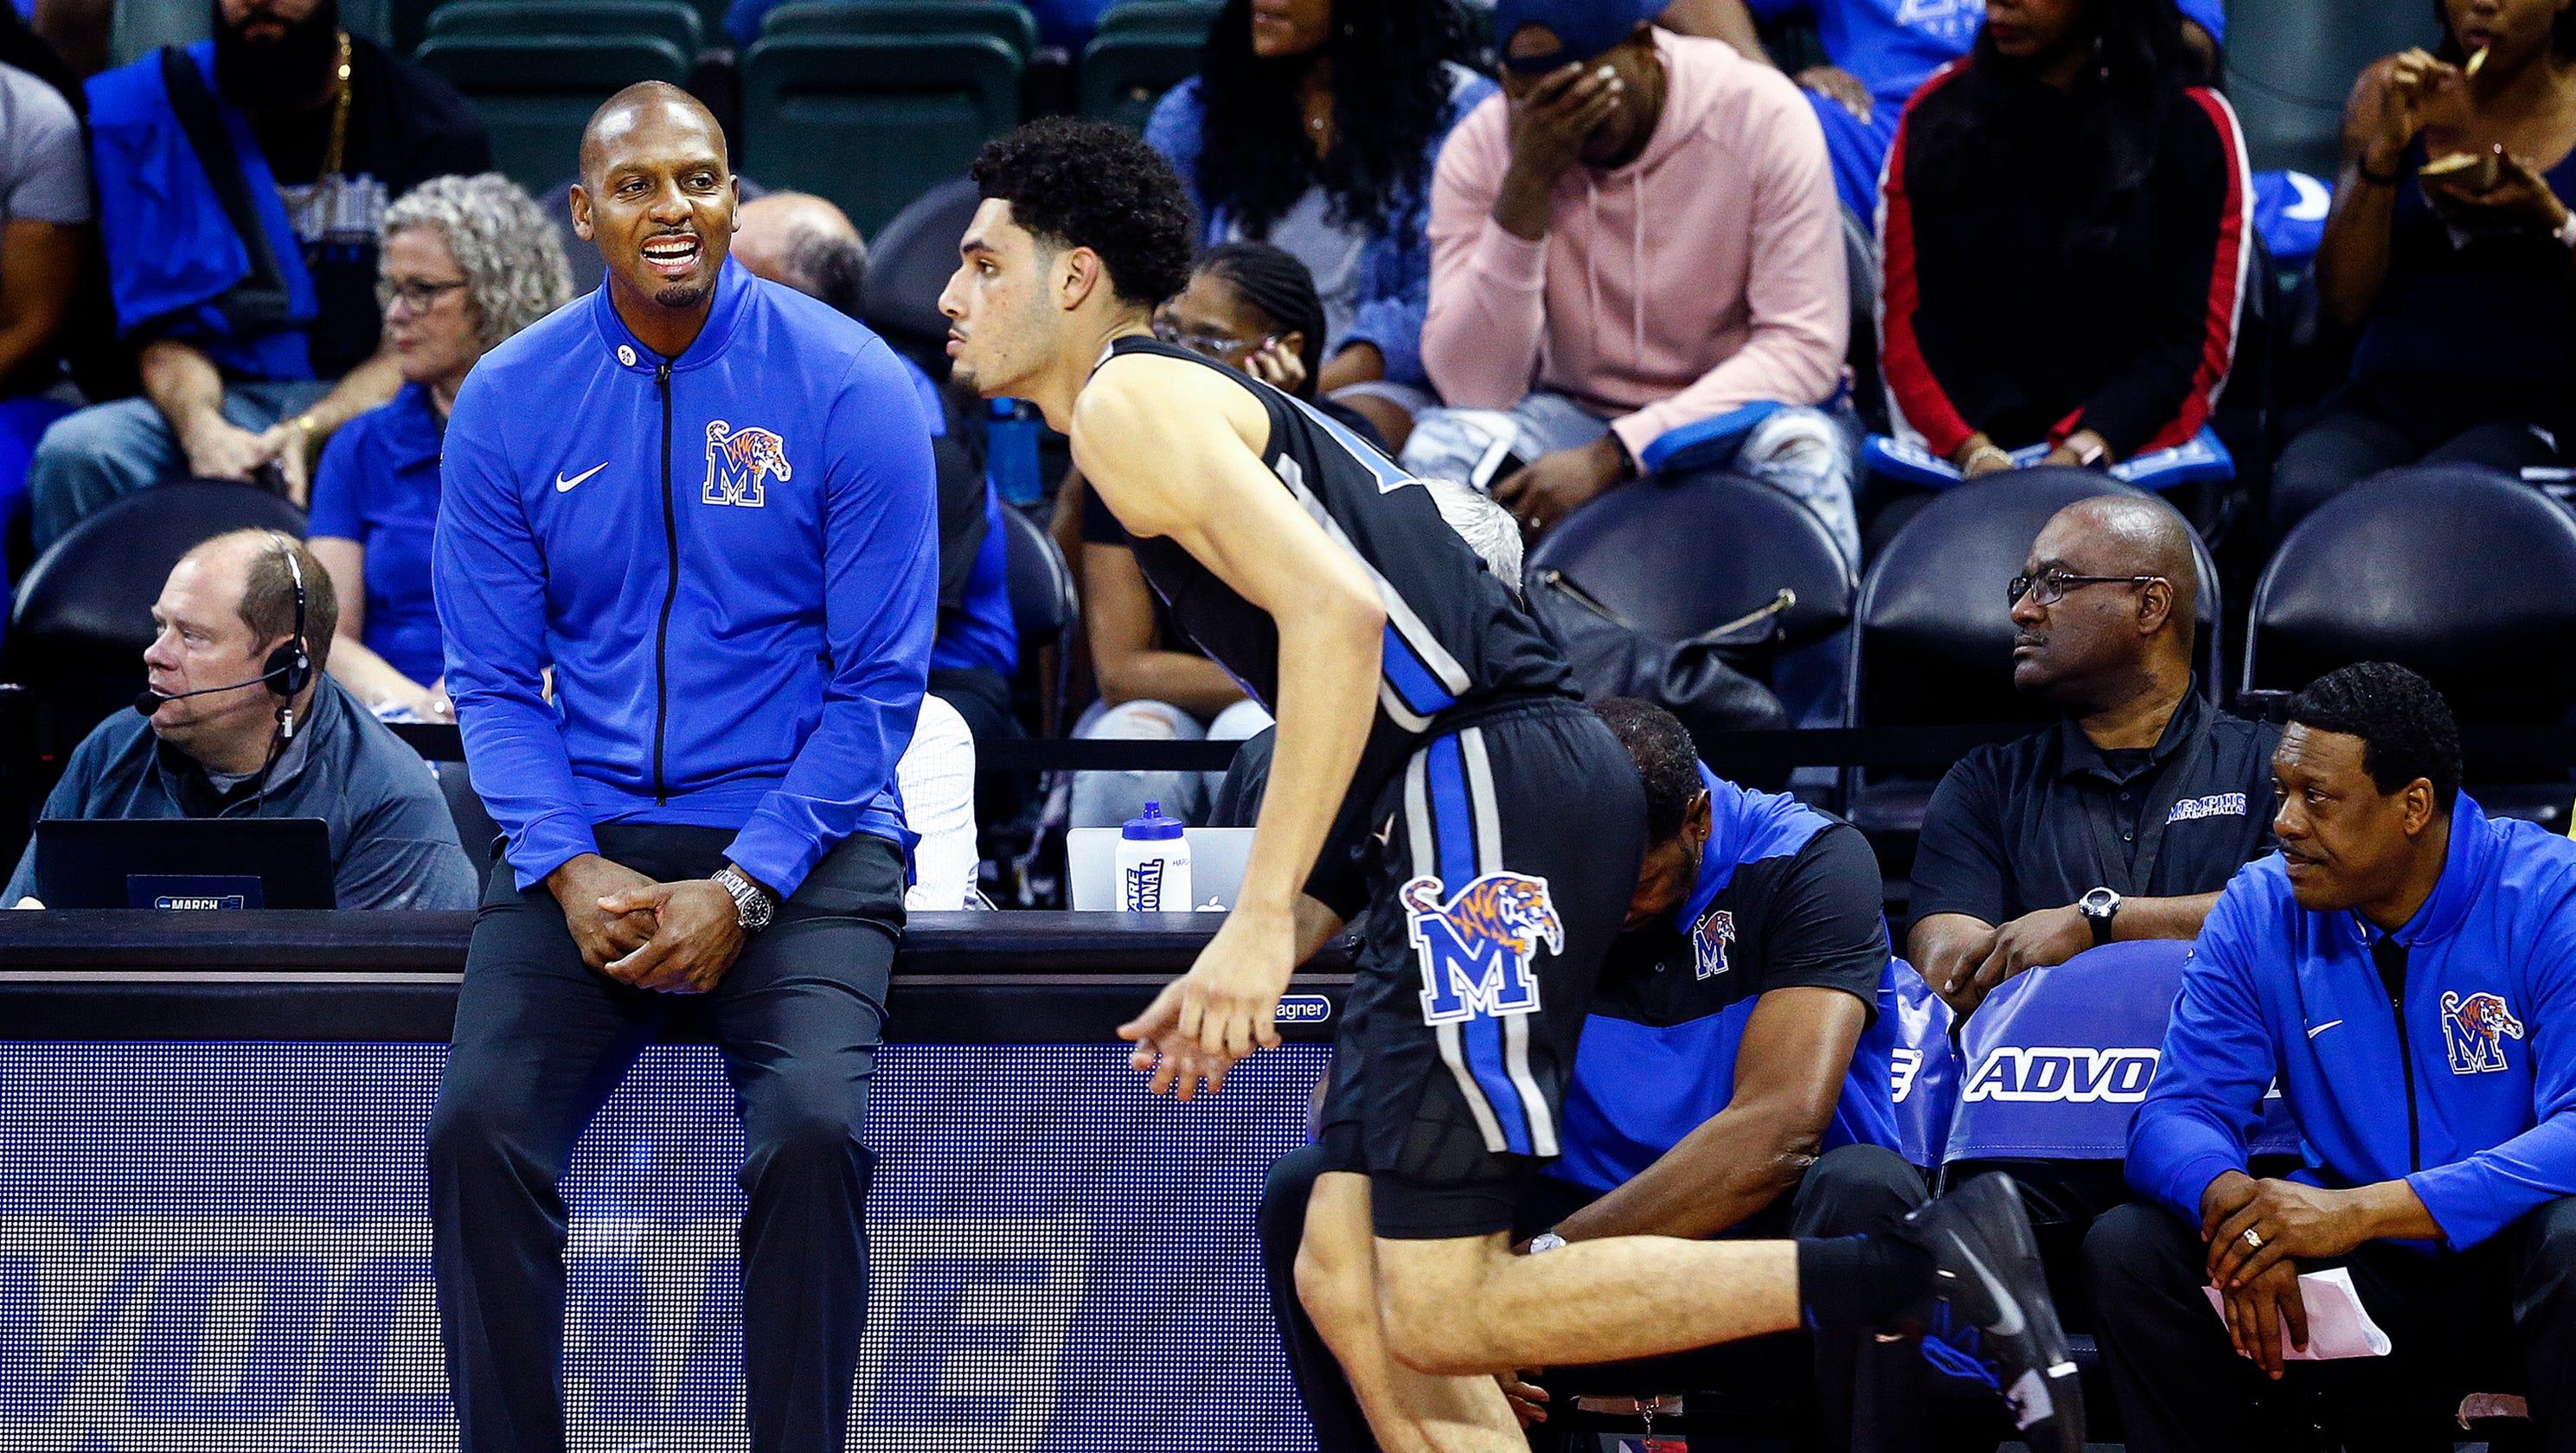 memphis basketball: penny hardaway team up, down in orlando